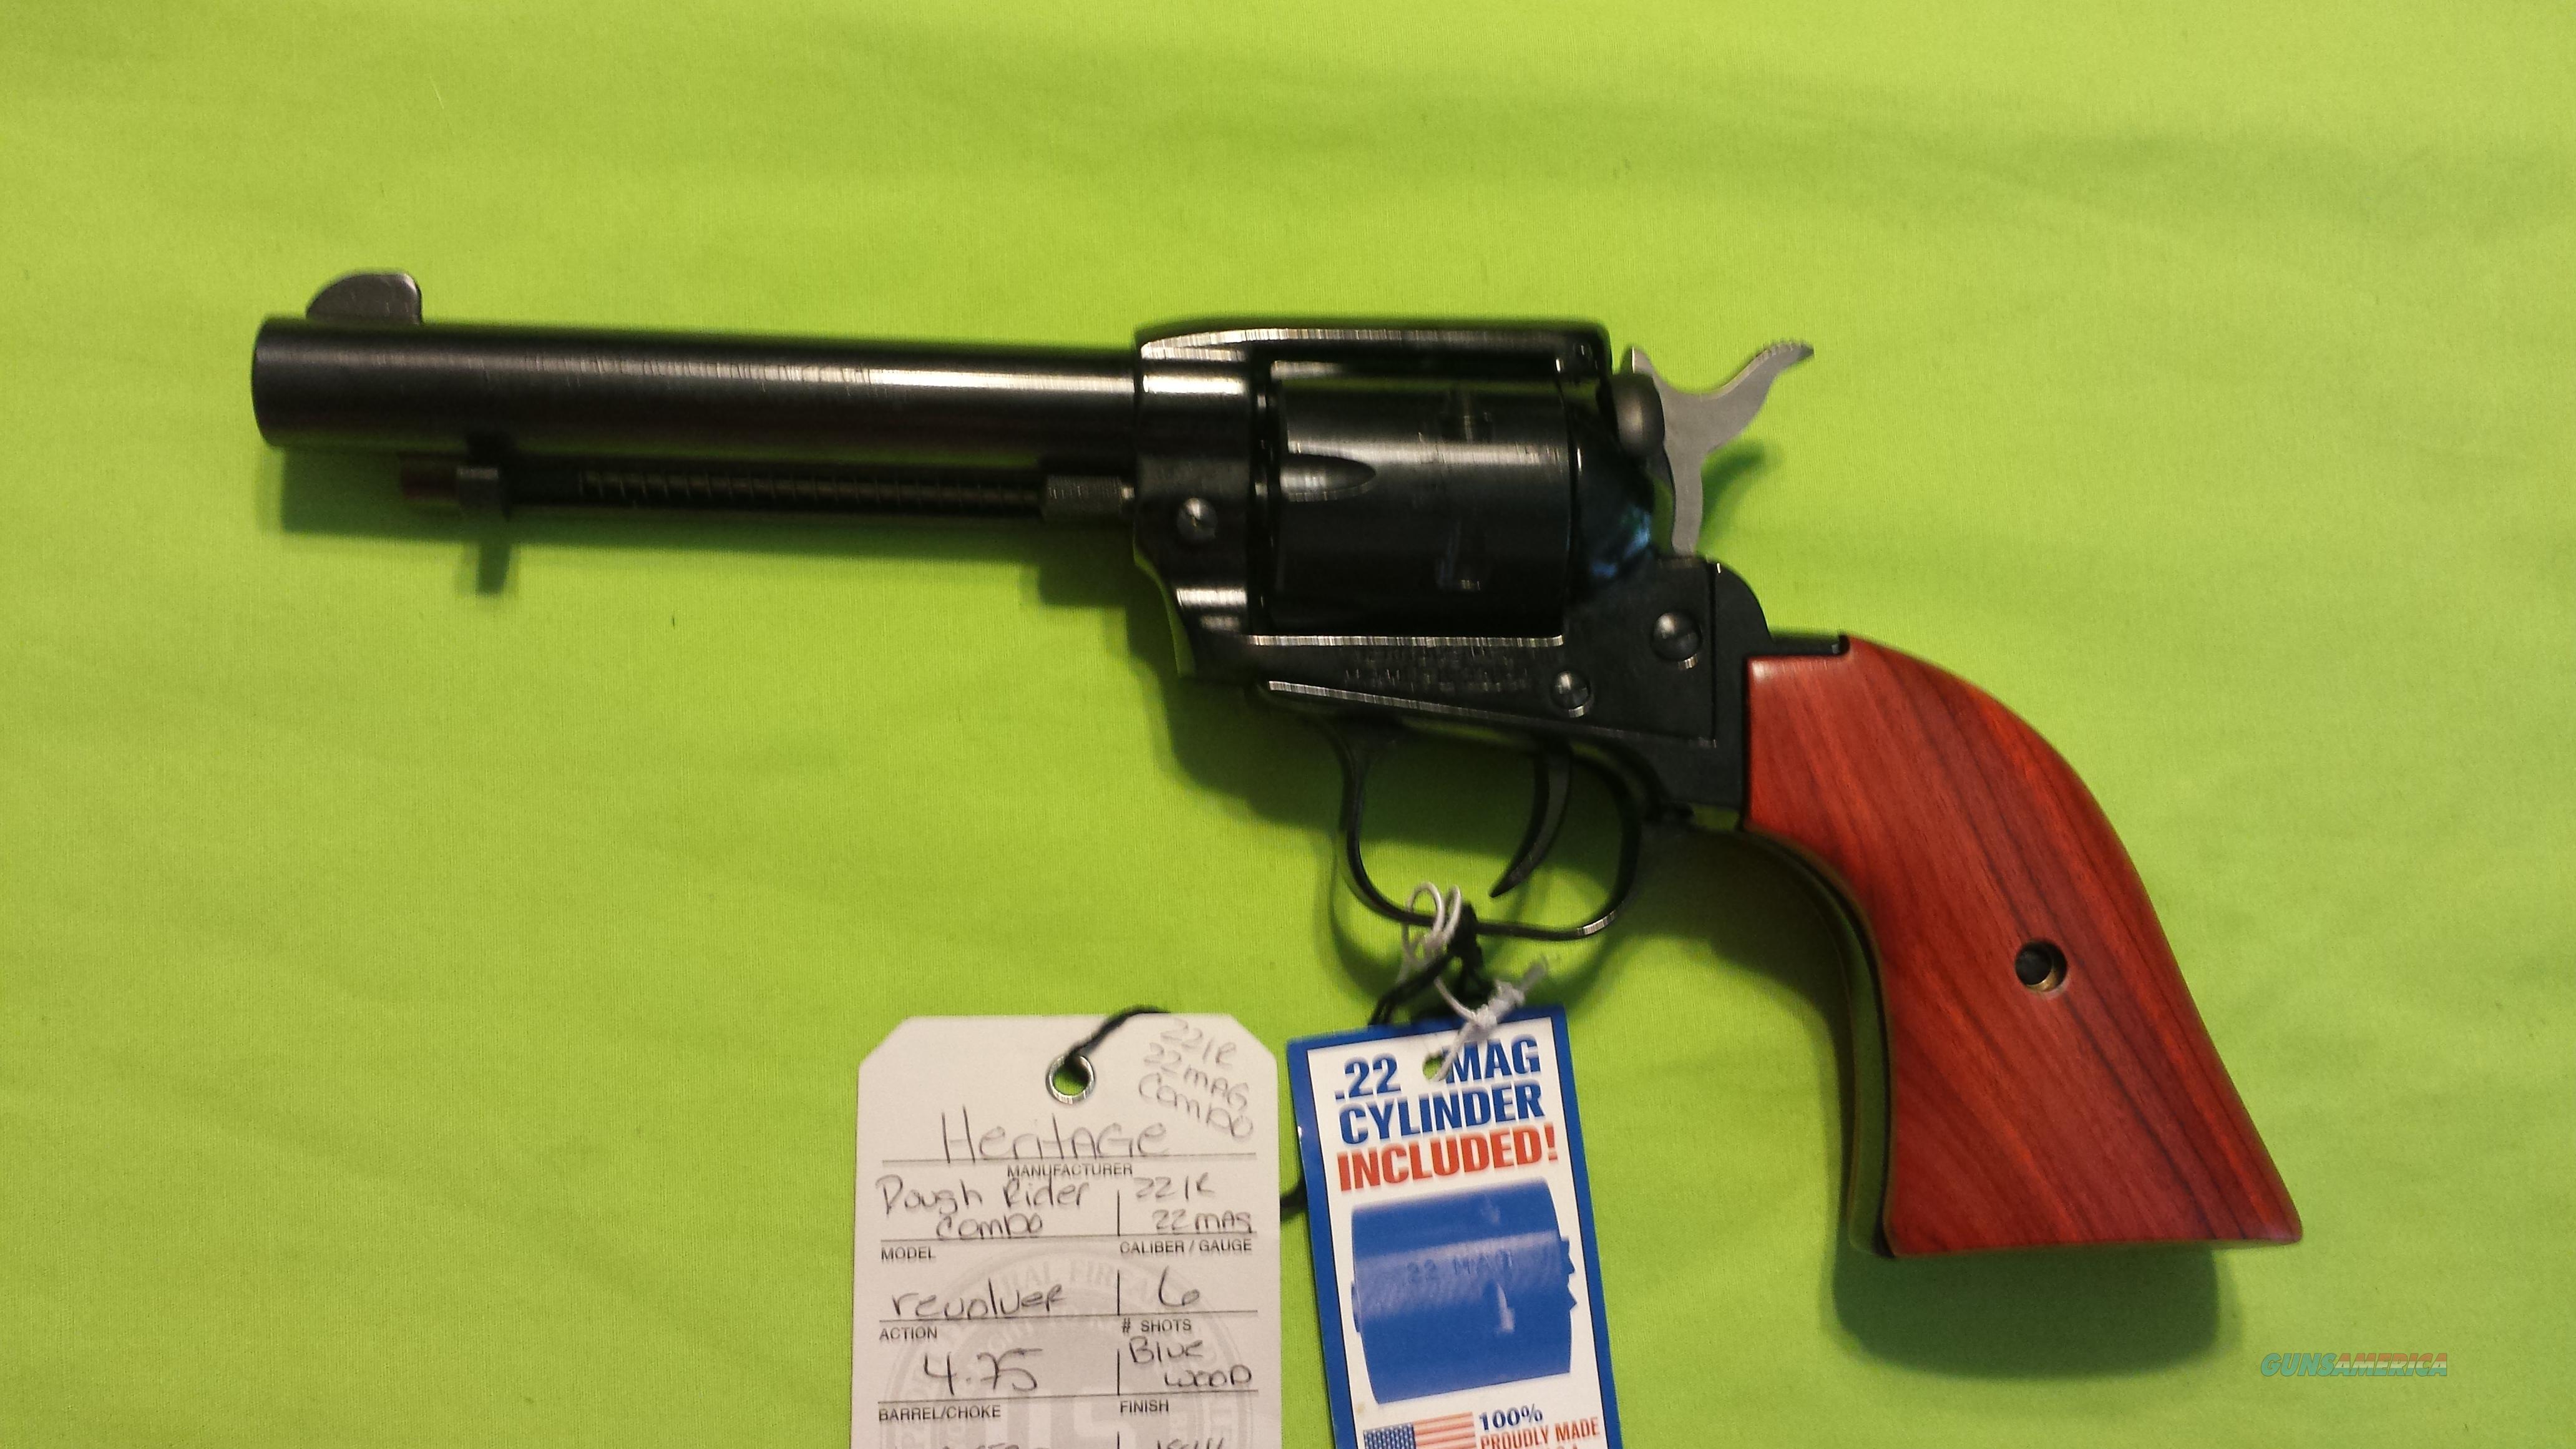 "HERITAGE ROUGH RIDER 22LR / 22MAG 4.75"" BLUE/WOOD  Guns > Pistols > H Misc Pistols"